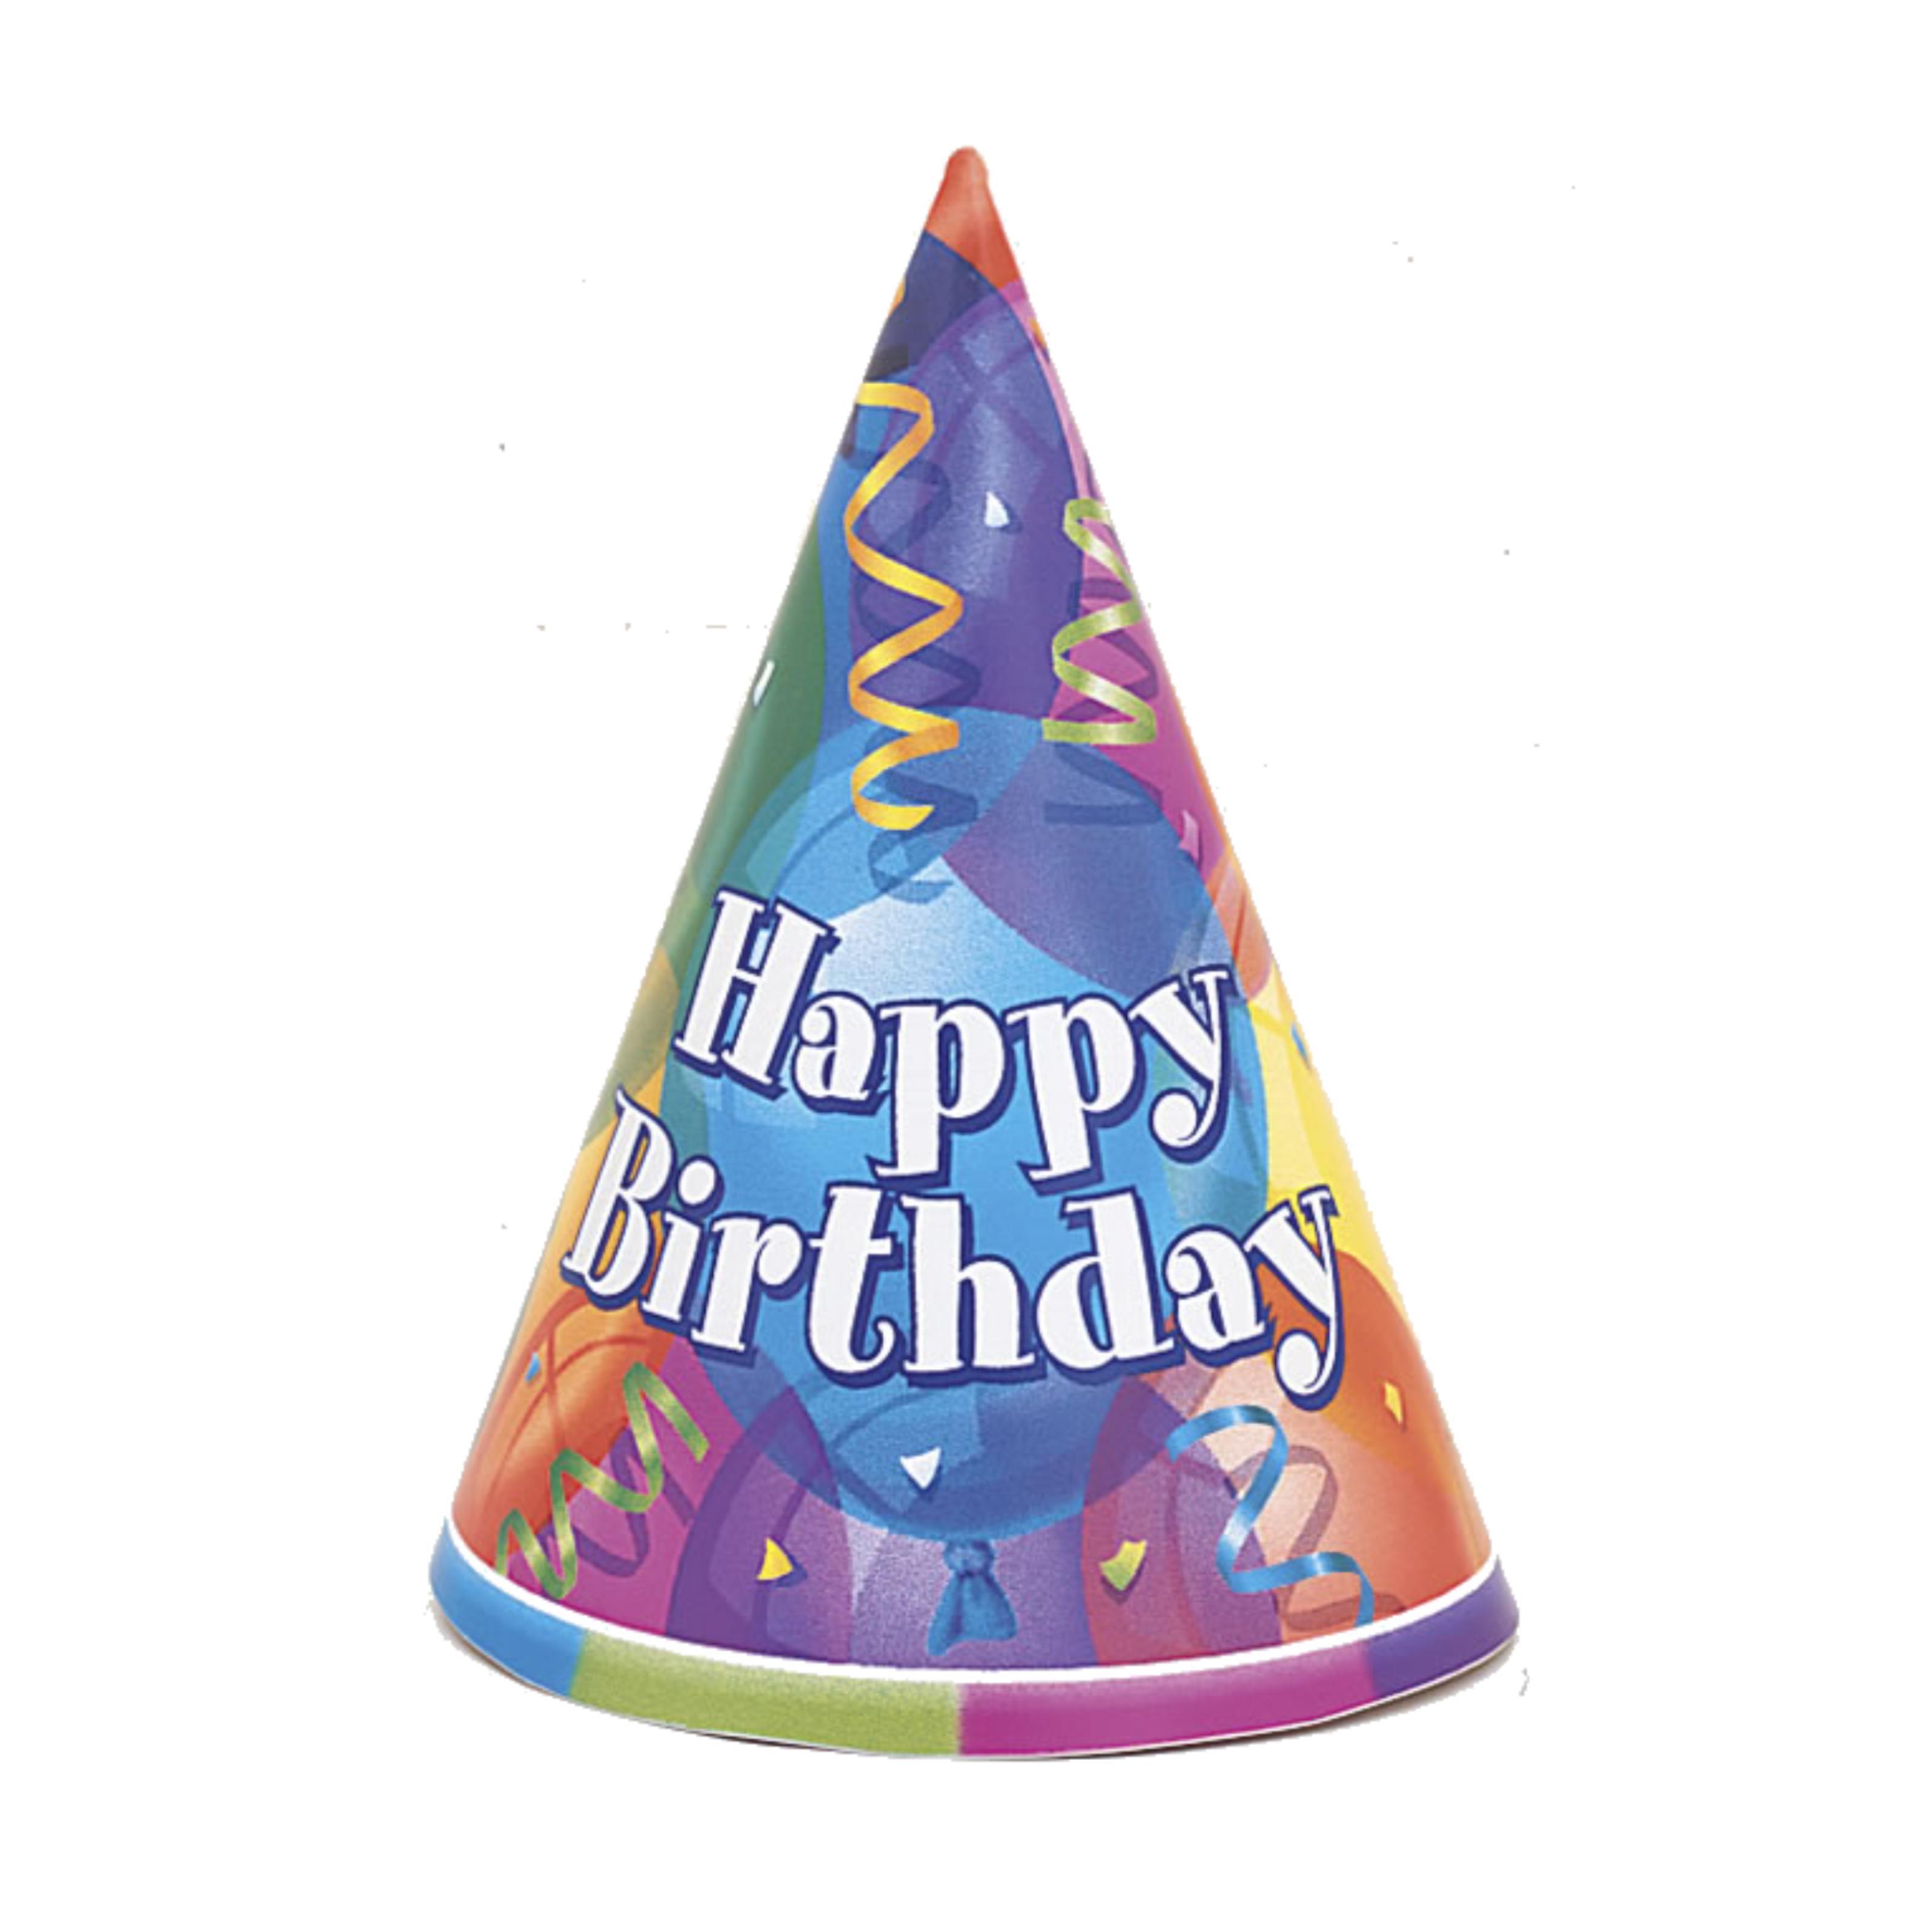 3189x3189 Birthday Hat Transparent Background Free Clipart 2